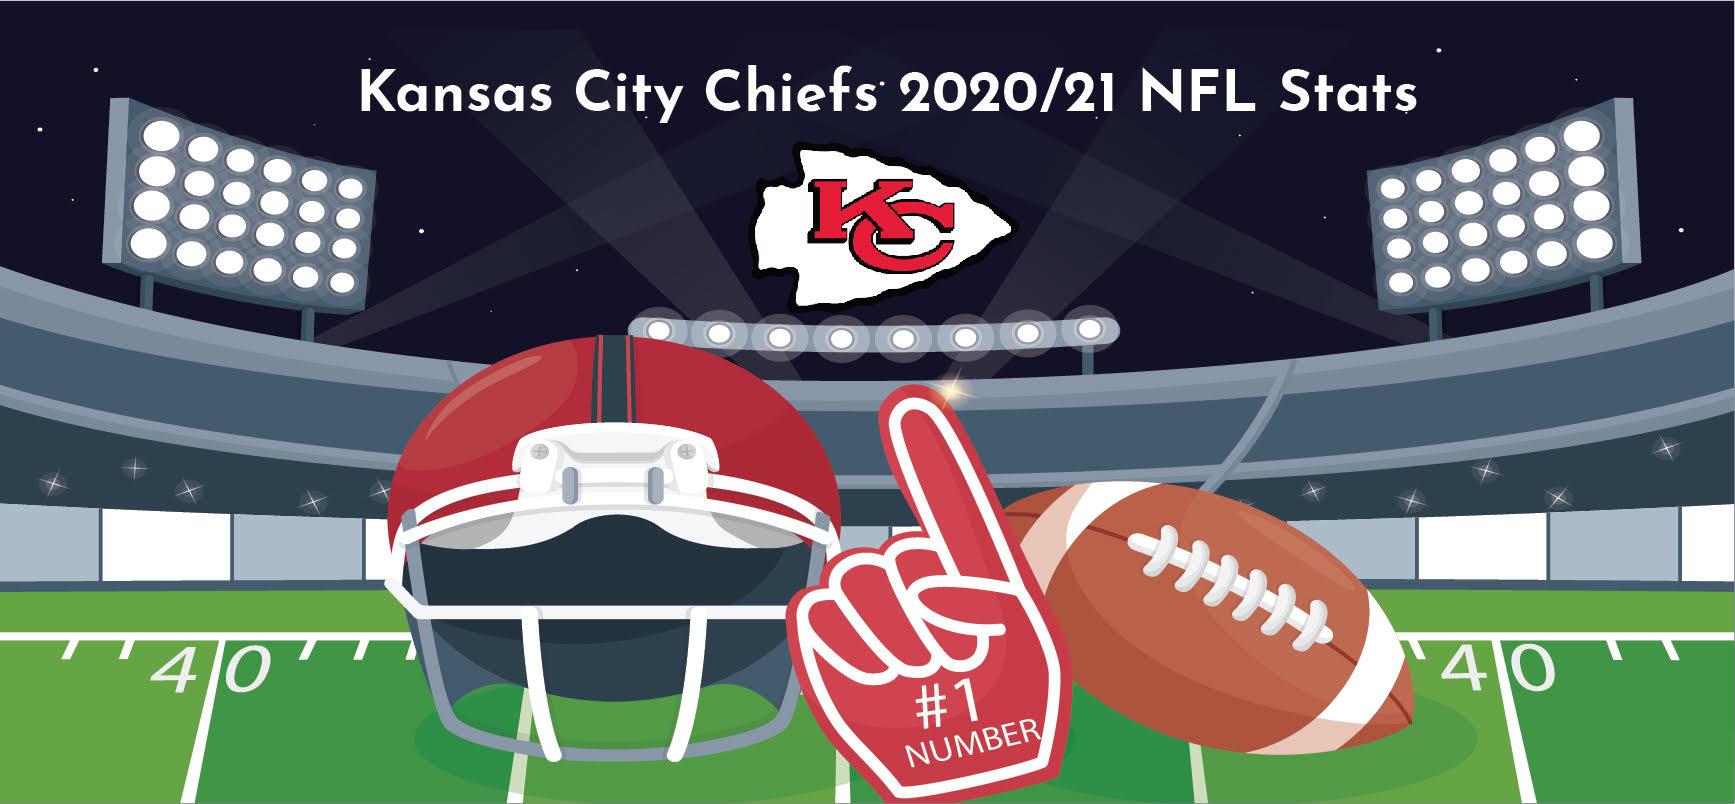 Kansas City Chiefs 2020/21 NFL Season Stats (Infographic)